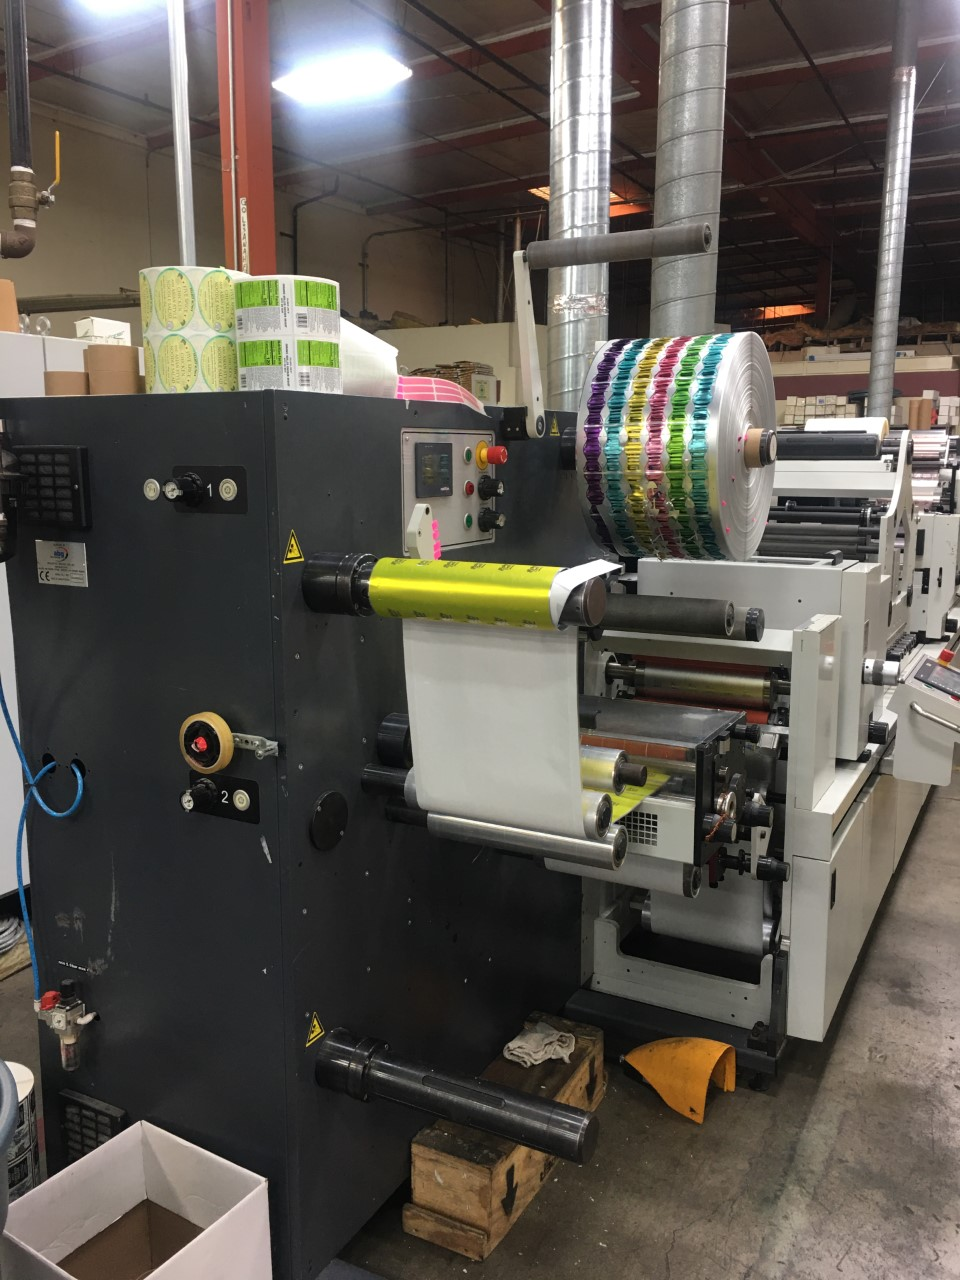 ABG Digicon Series 2 - Used Flexo Printing Presses and Used Flexographic Equipment-7